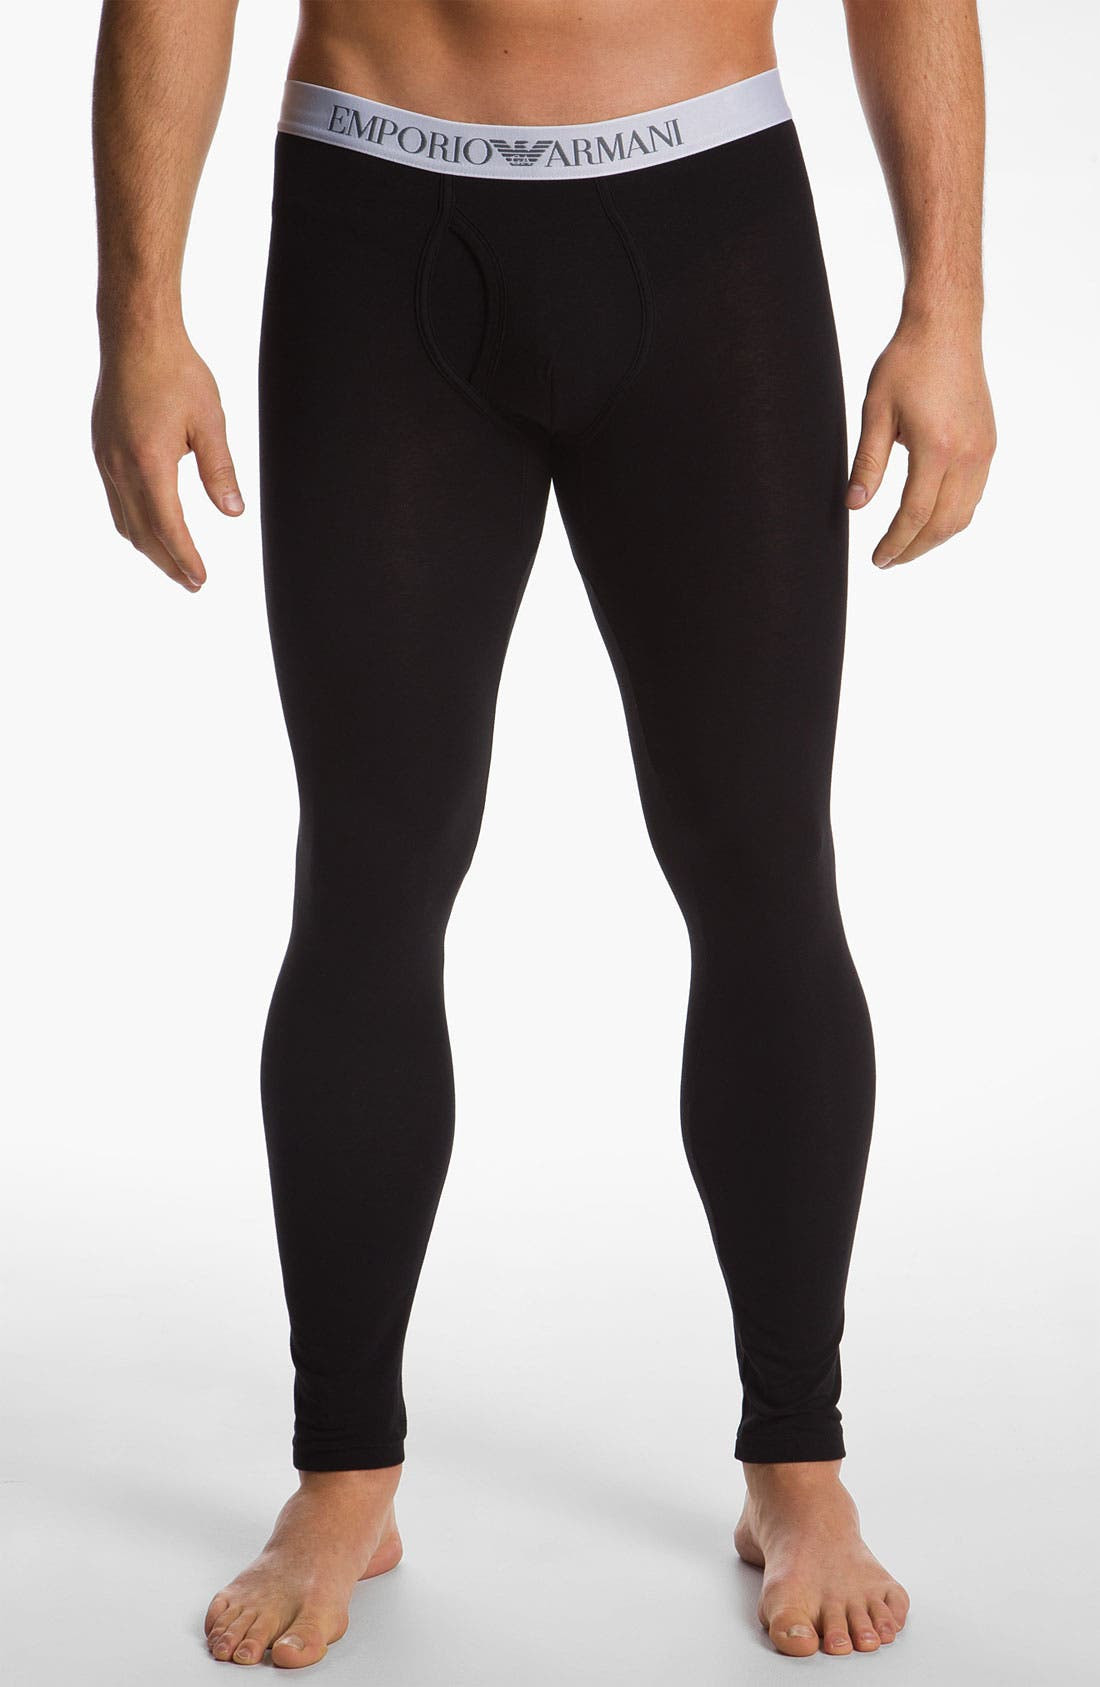 Main Image - Emporio Armani 'Basic' Stretch Leggings